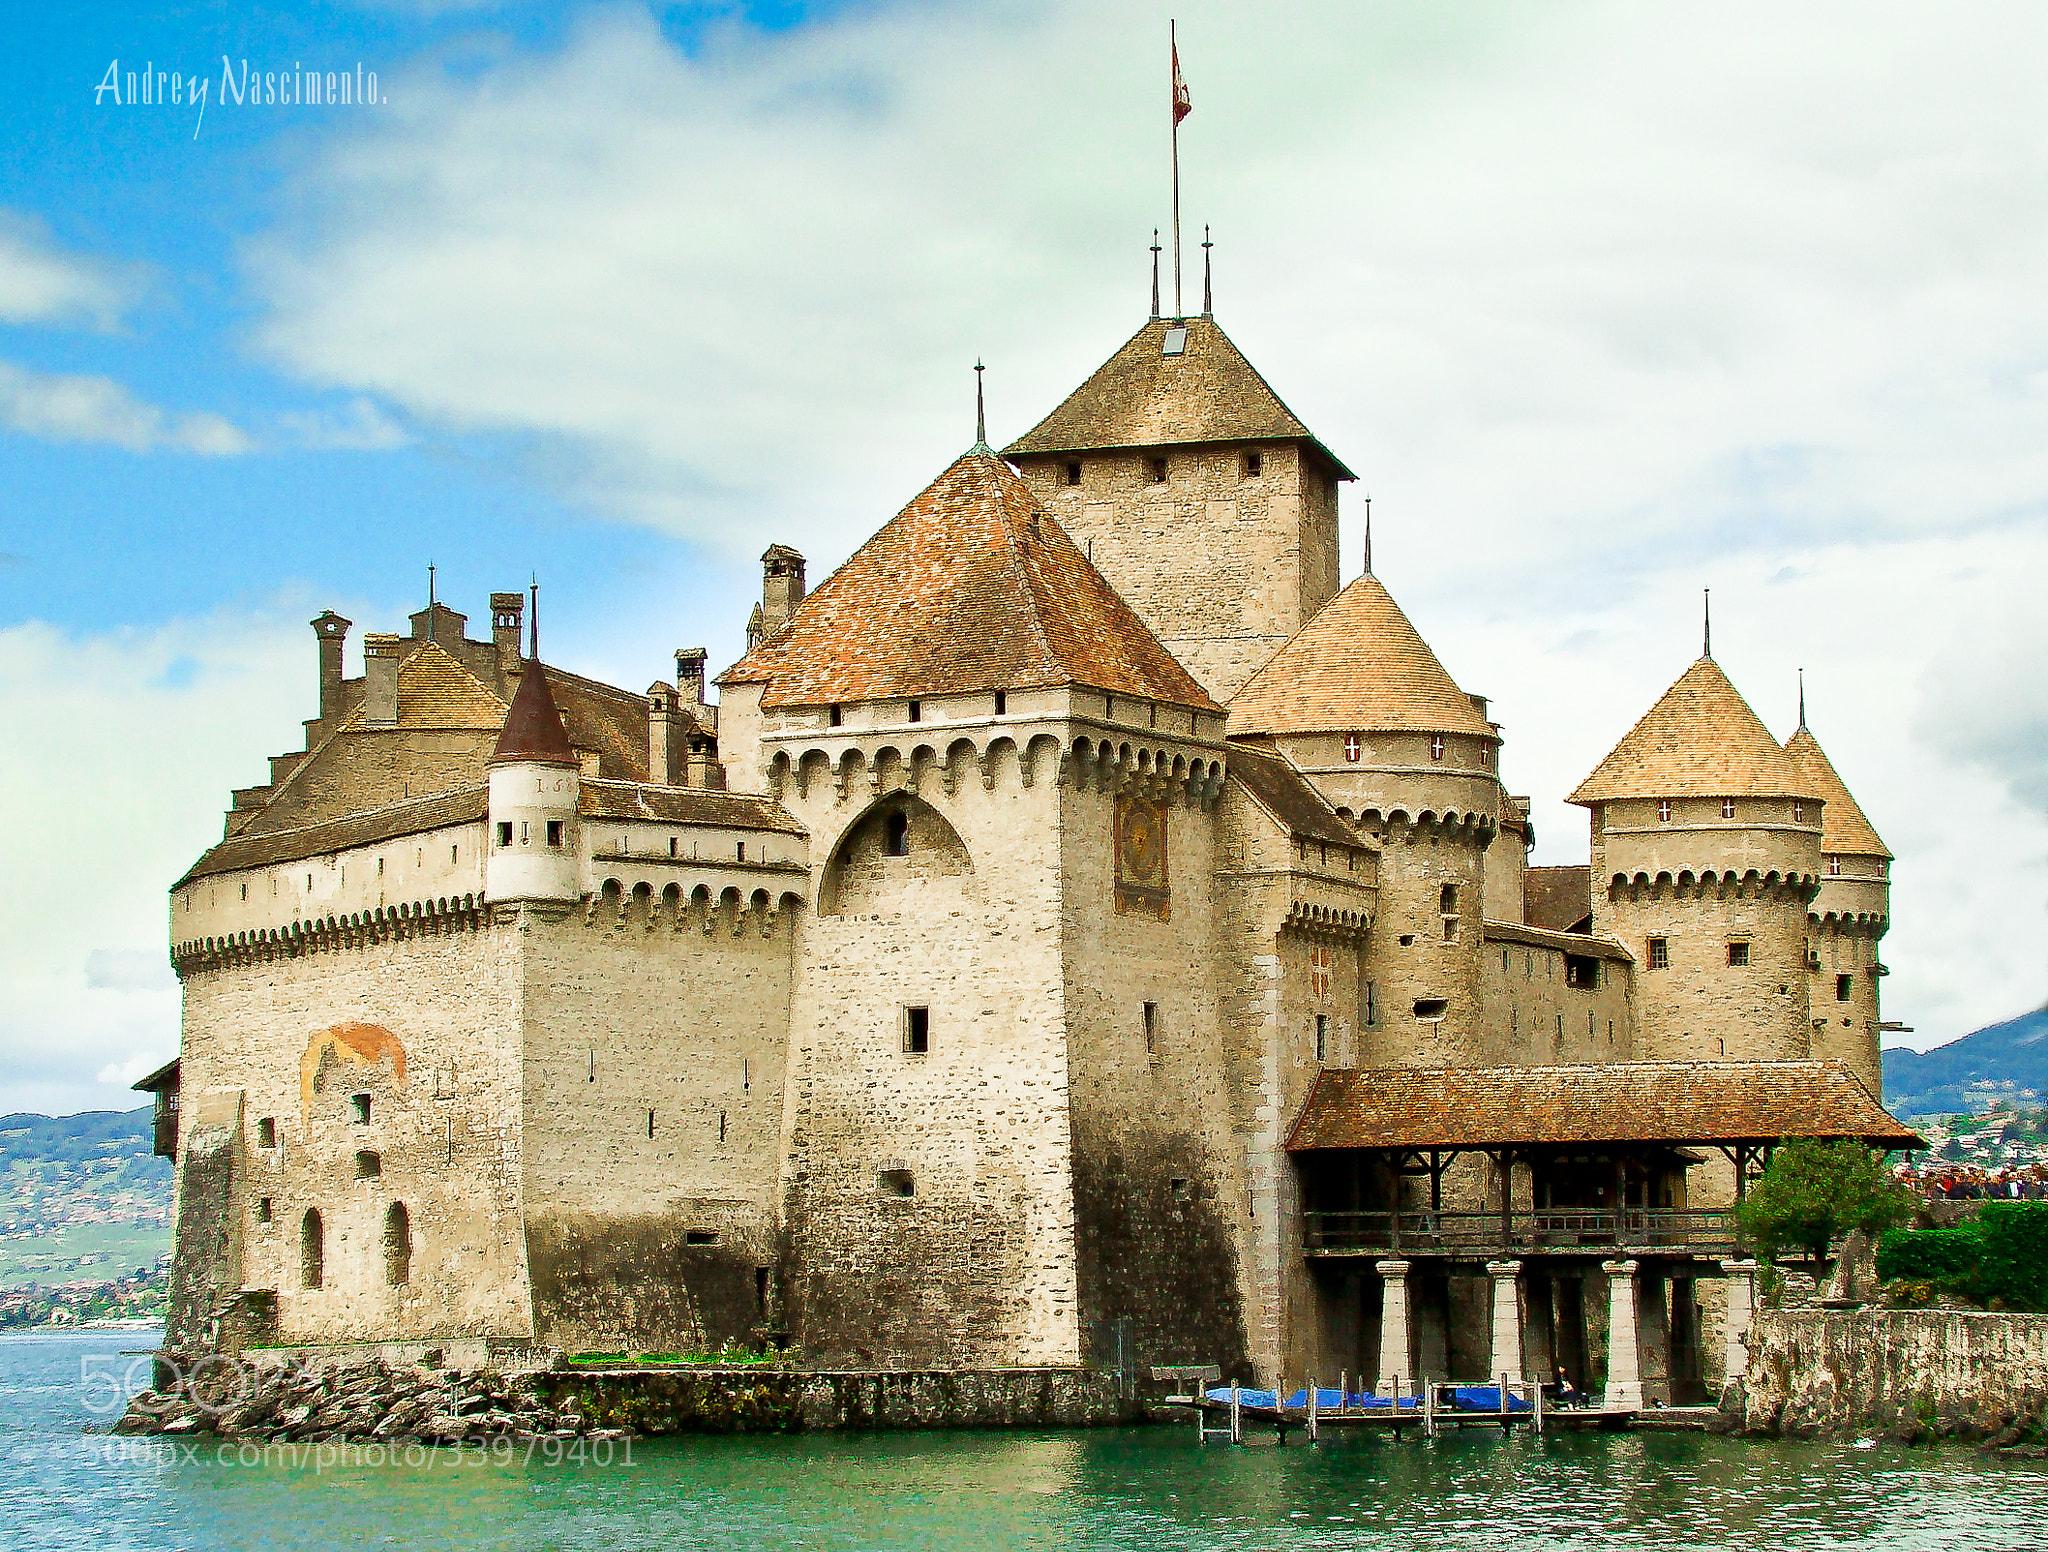 Photograph Chateau de Chillon by Andrey Nascimento on 500px